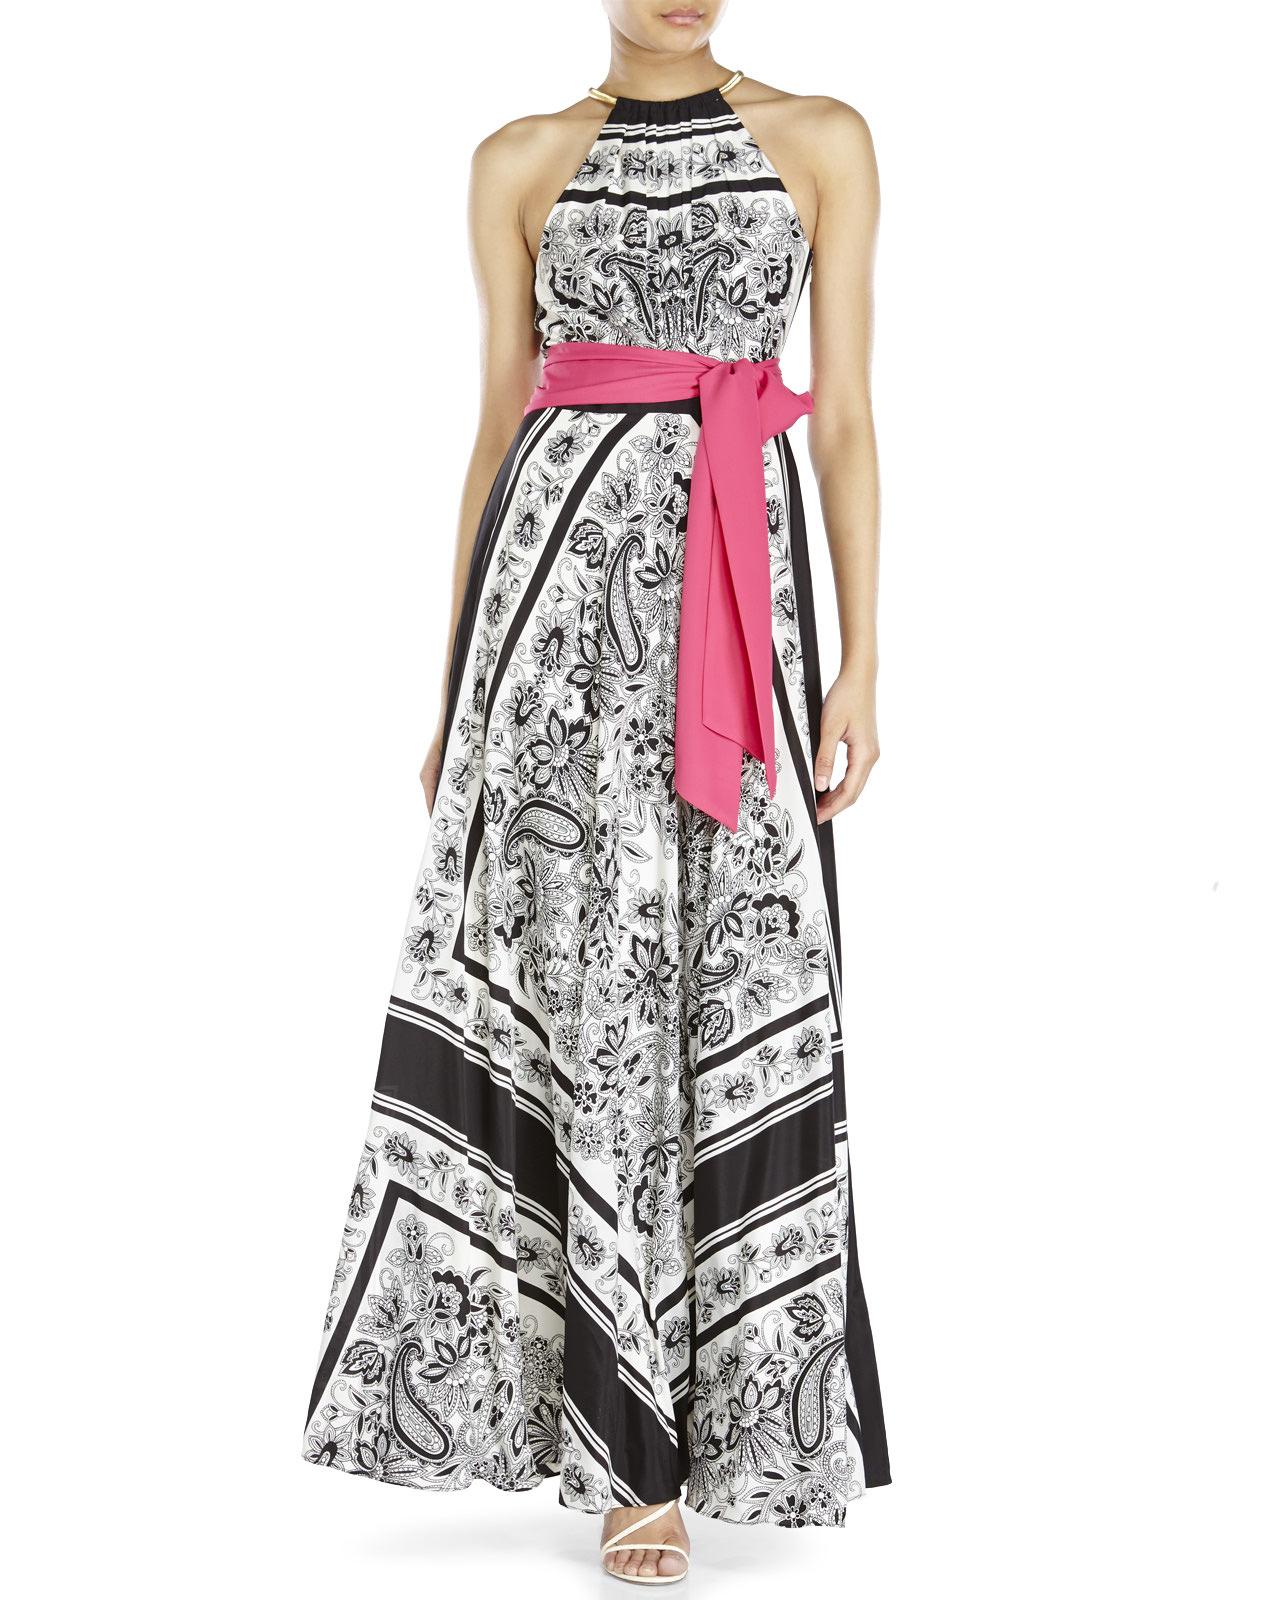 383fc42ce700 Lyst - Eliza J Black   White Floral Belted Maxi Dress in Pink